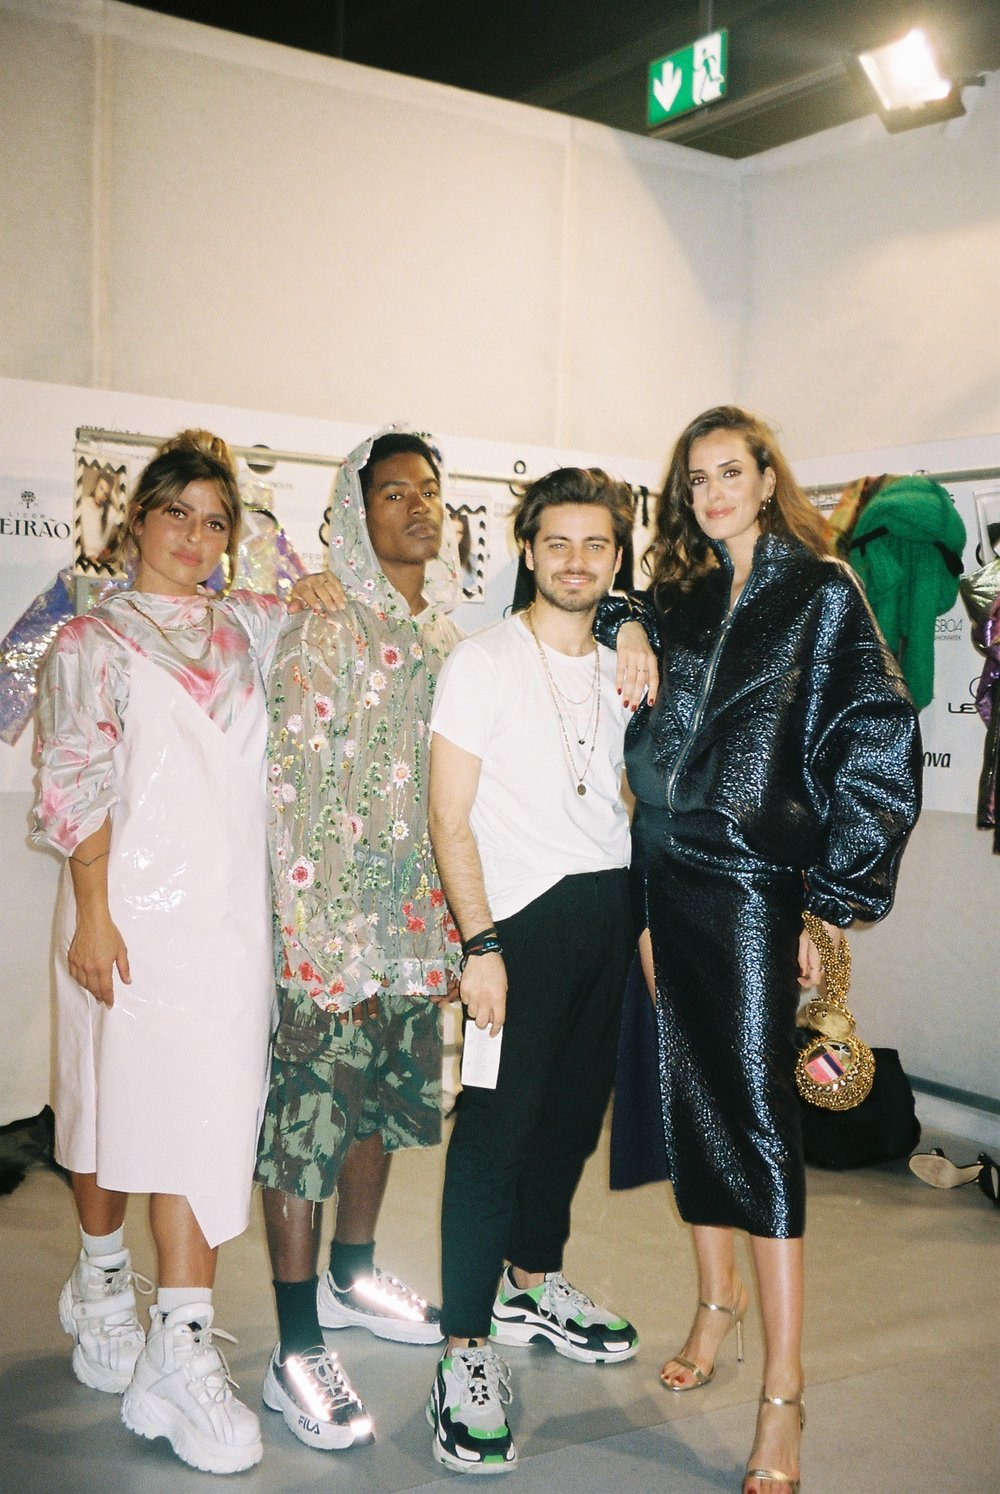 Maria Sampaio, Gonçalo Cabral, Goncalo Peixoto and myself at Lisbon's fashion week backstage.  /Maria Sampaio, Gonçalo Cabral, Goncalo Peixoto e eu no backstage da ModaLisboa.